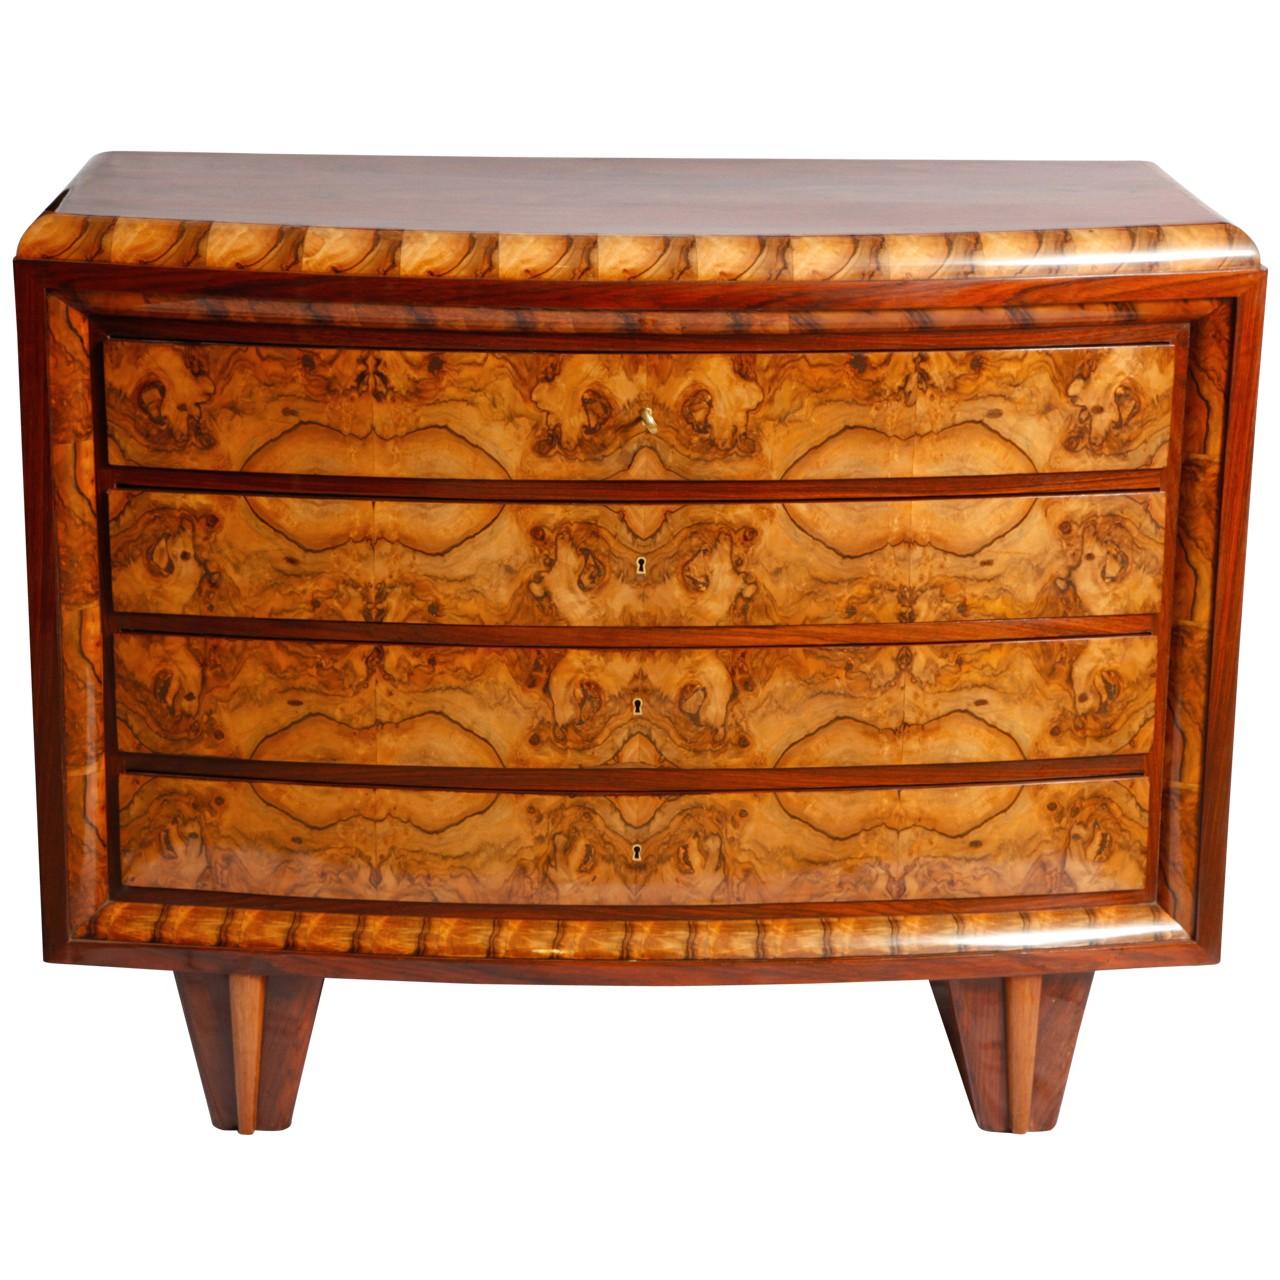 Walnut art-deco chest of drawers